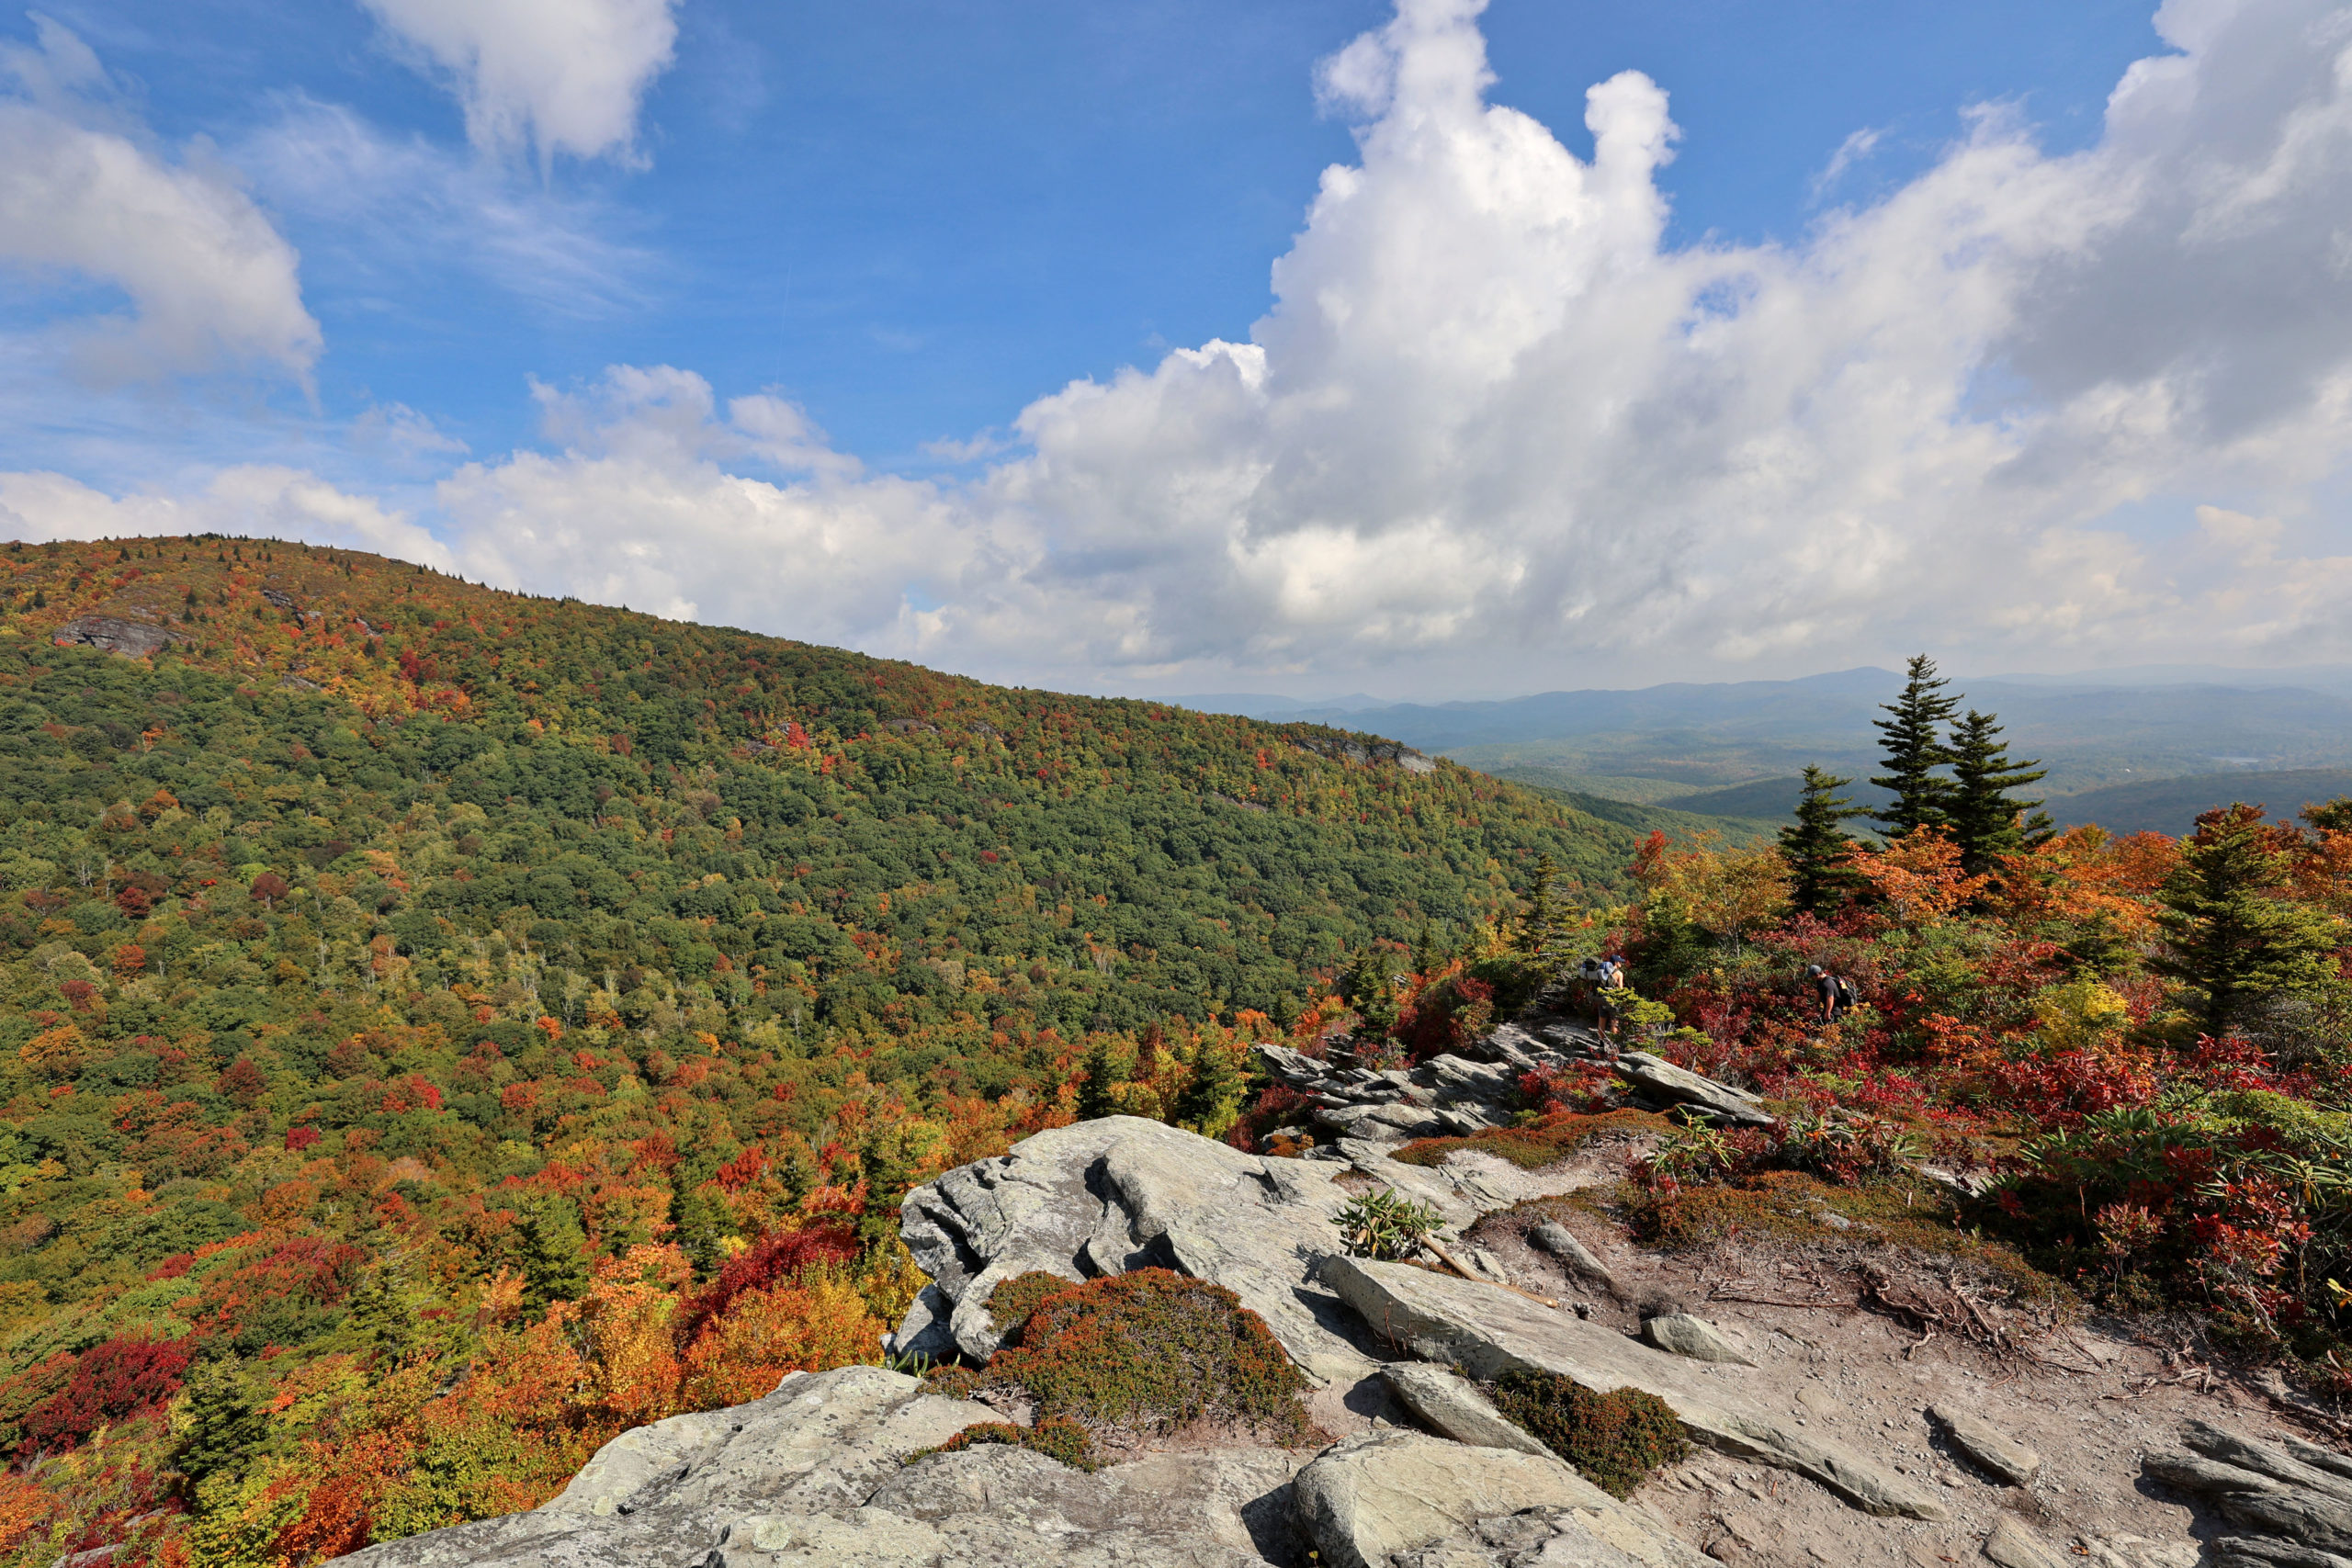 Cragway Trail view